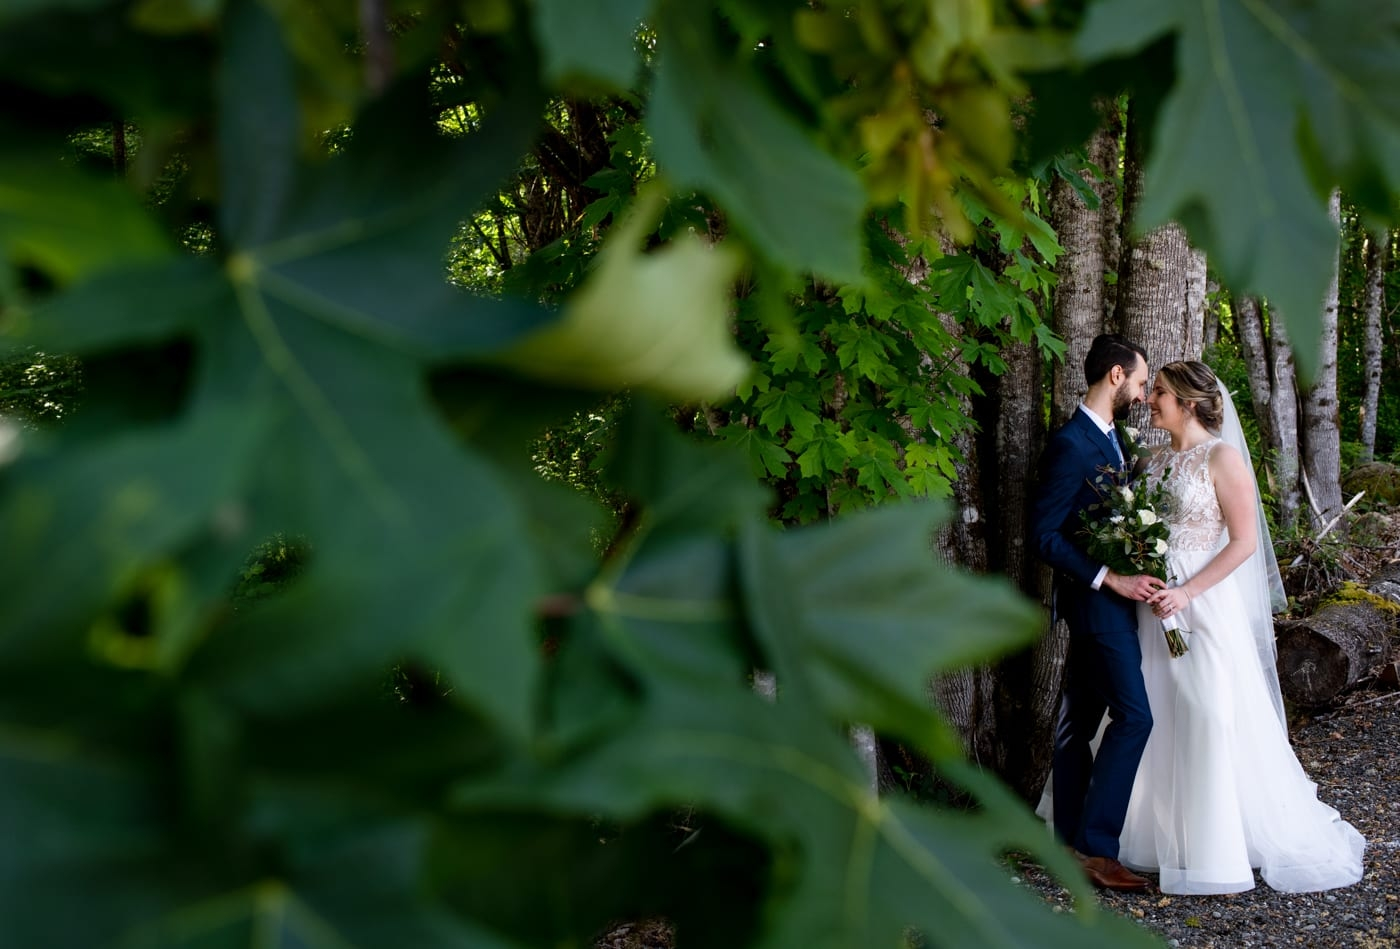 Couple-Amongst-Leaves-Trinity-Tree-Farm-Wedding-Photos-Greener-Visuals